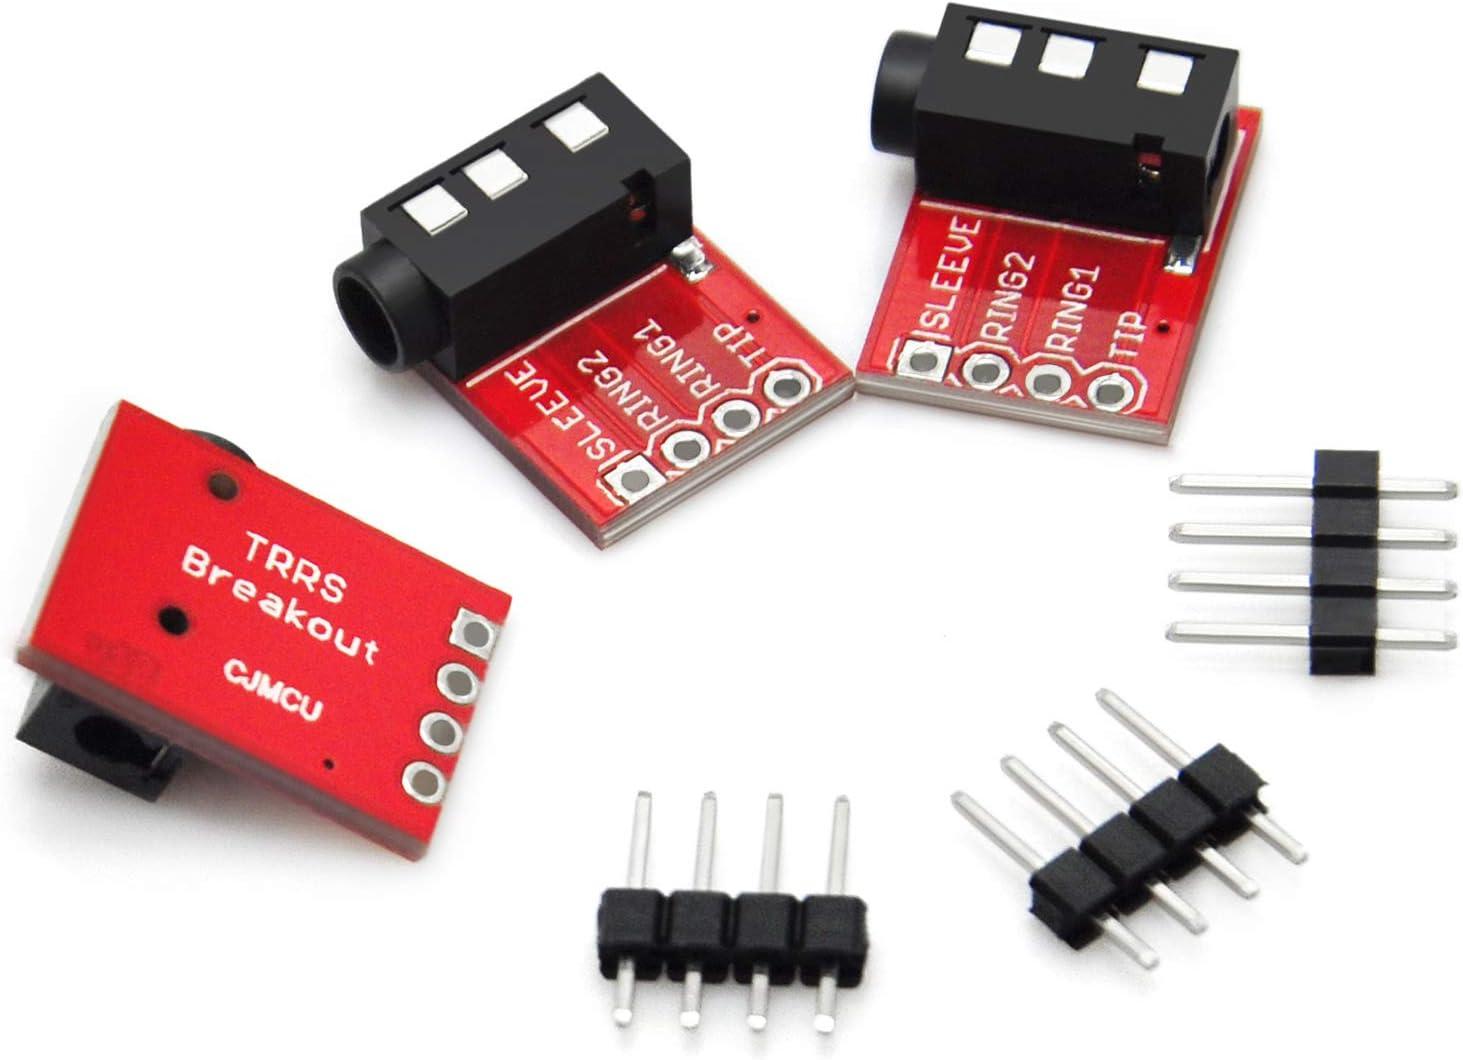 Gikfun TRRS 3.5mm Jack Breakout Headphone Video Audio MP3 Jack for Arduino Pack